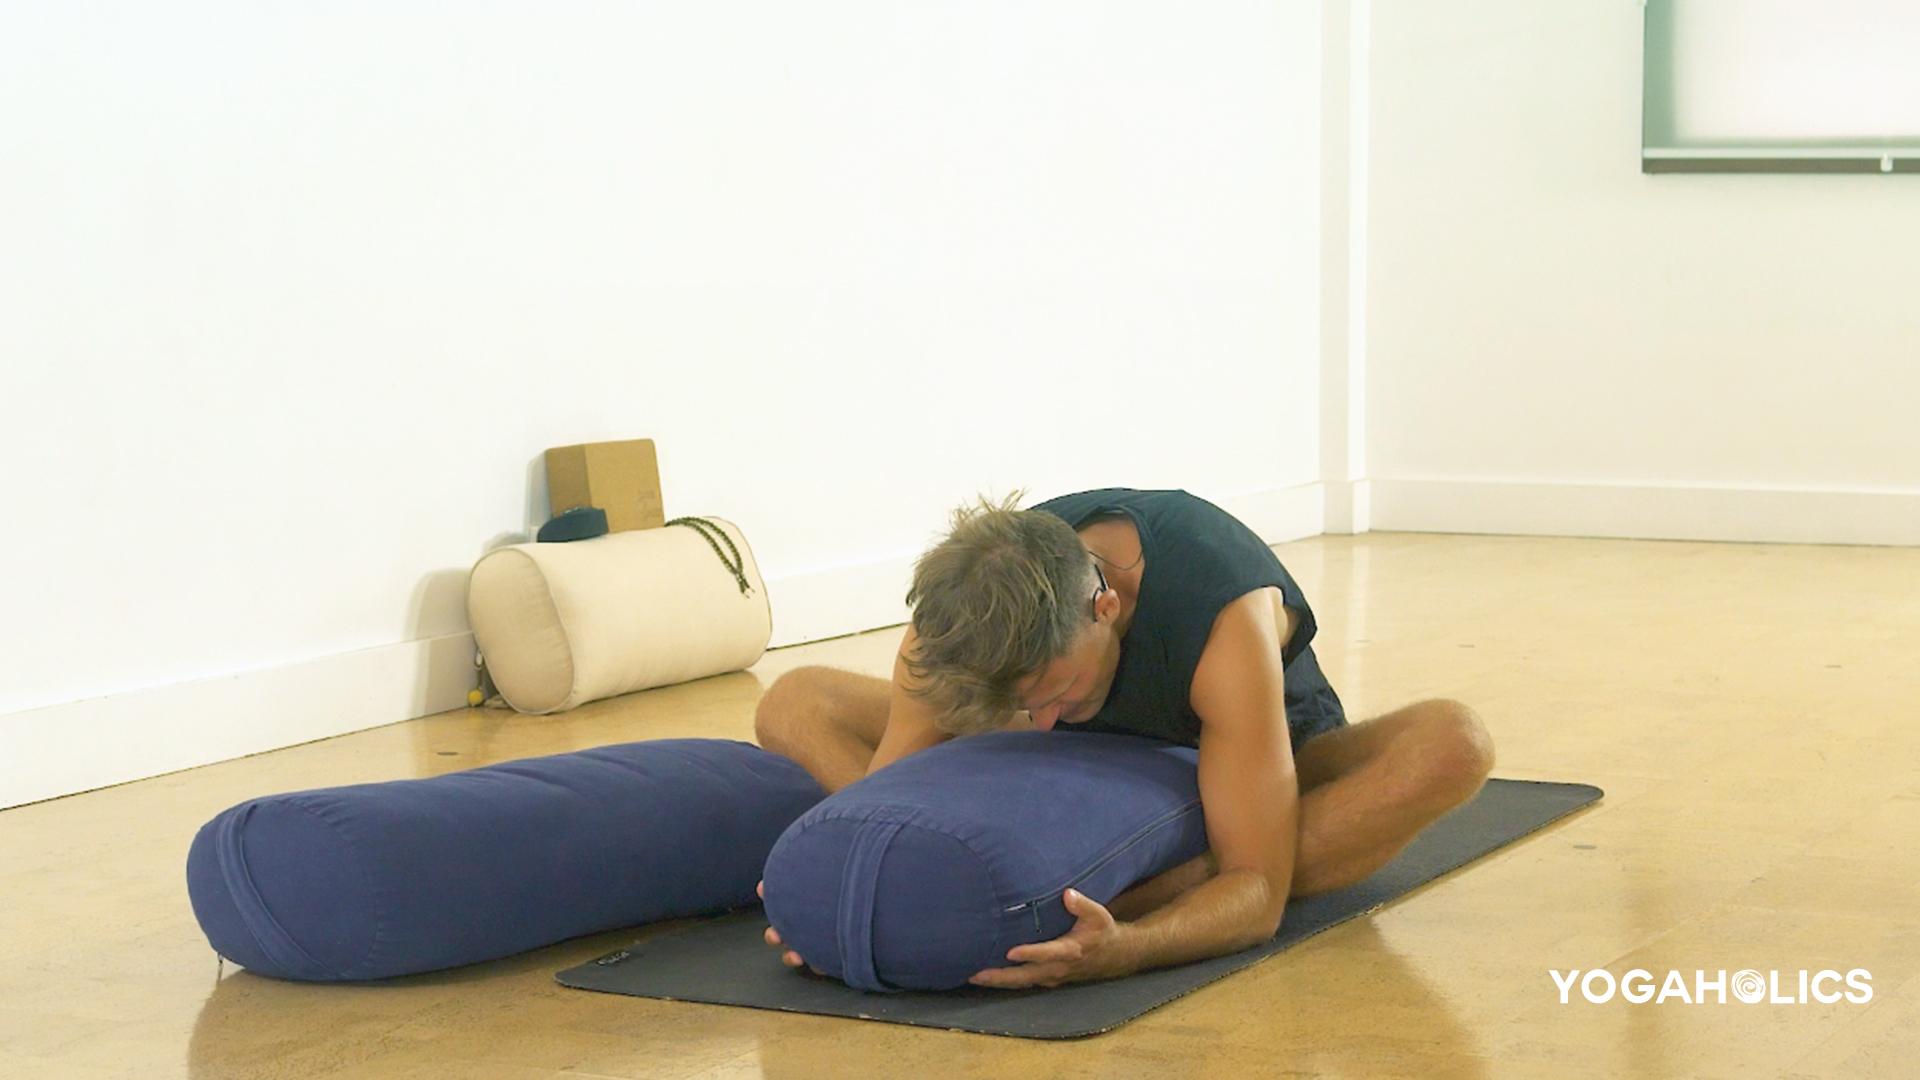 Bed Yoga | Duncan Parviainen